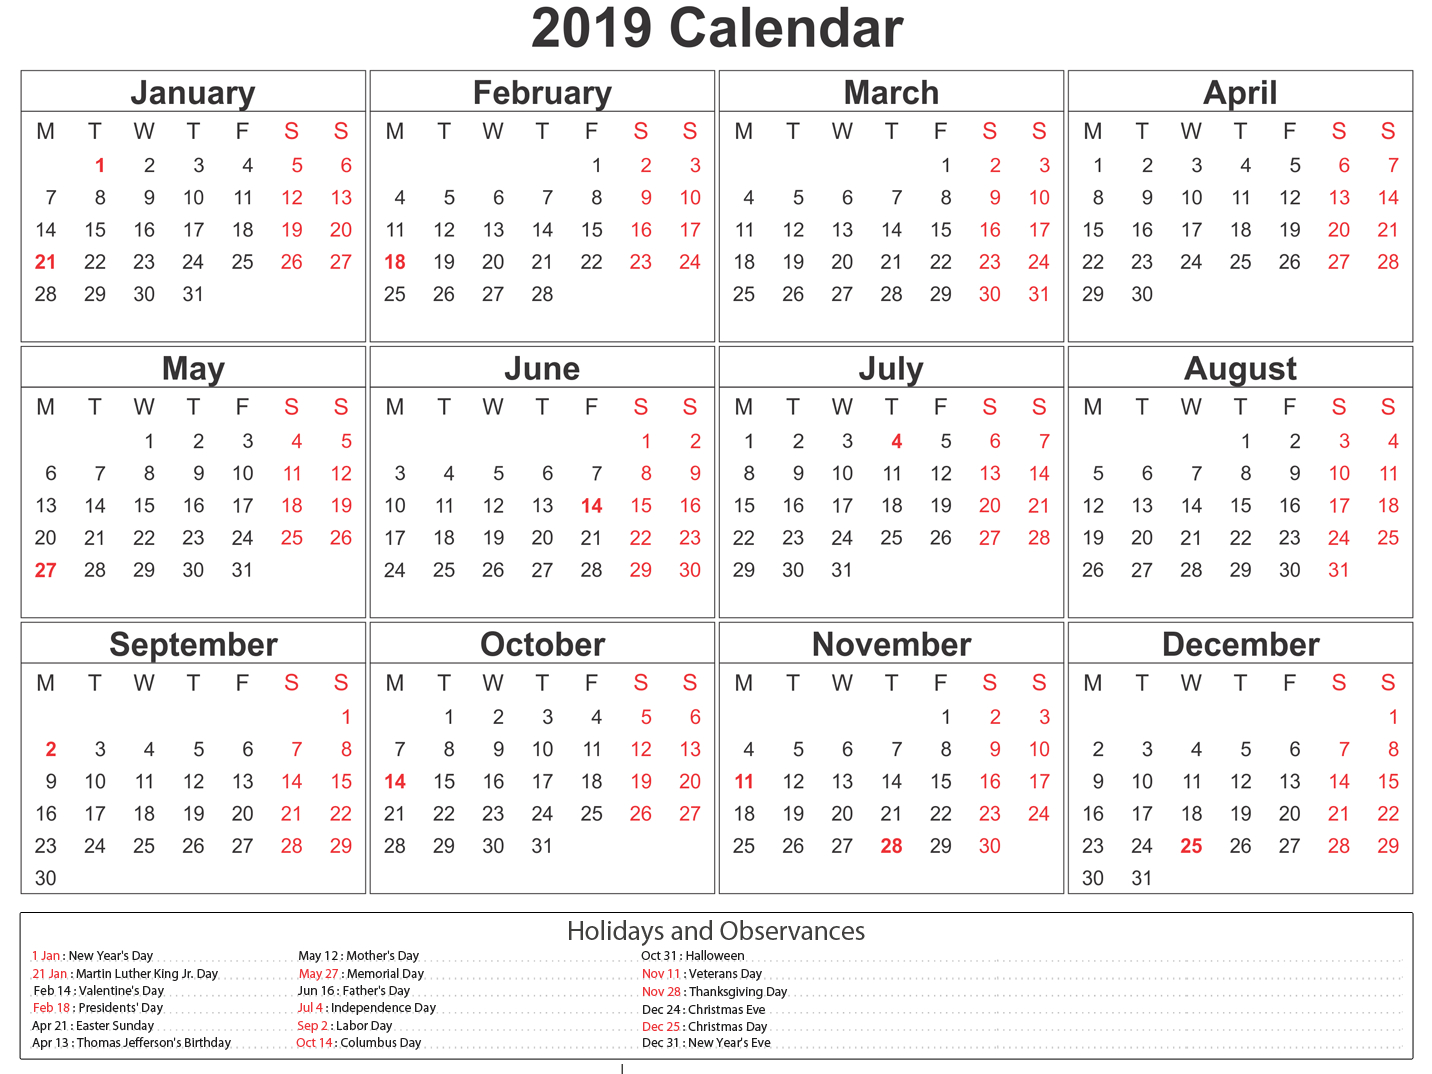 Printable South Africa 2019 Calendar #southafrica #calendar